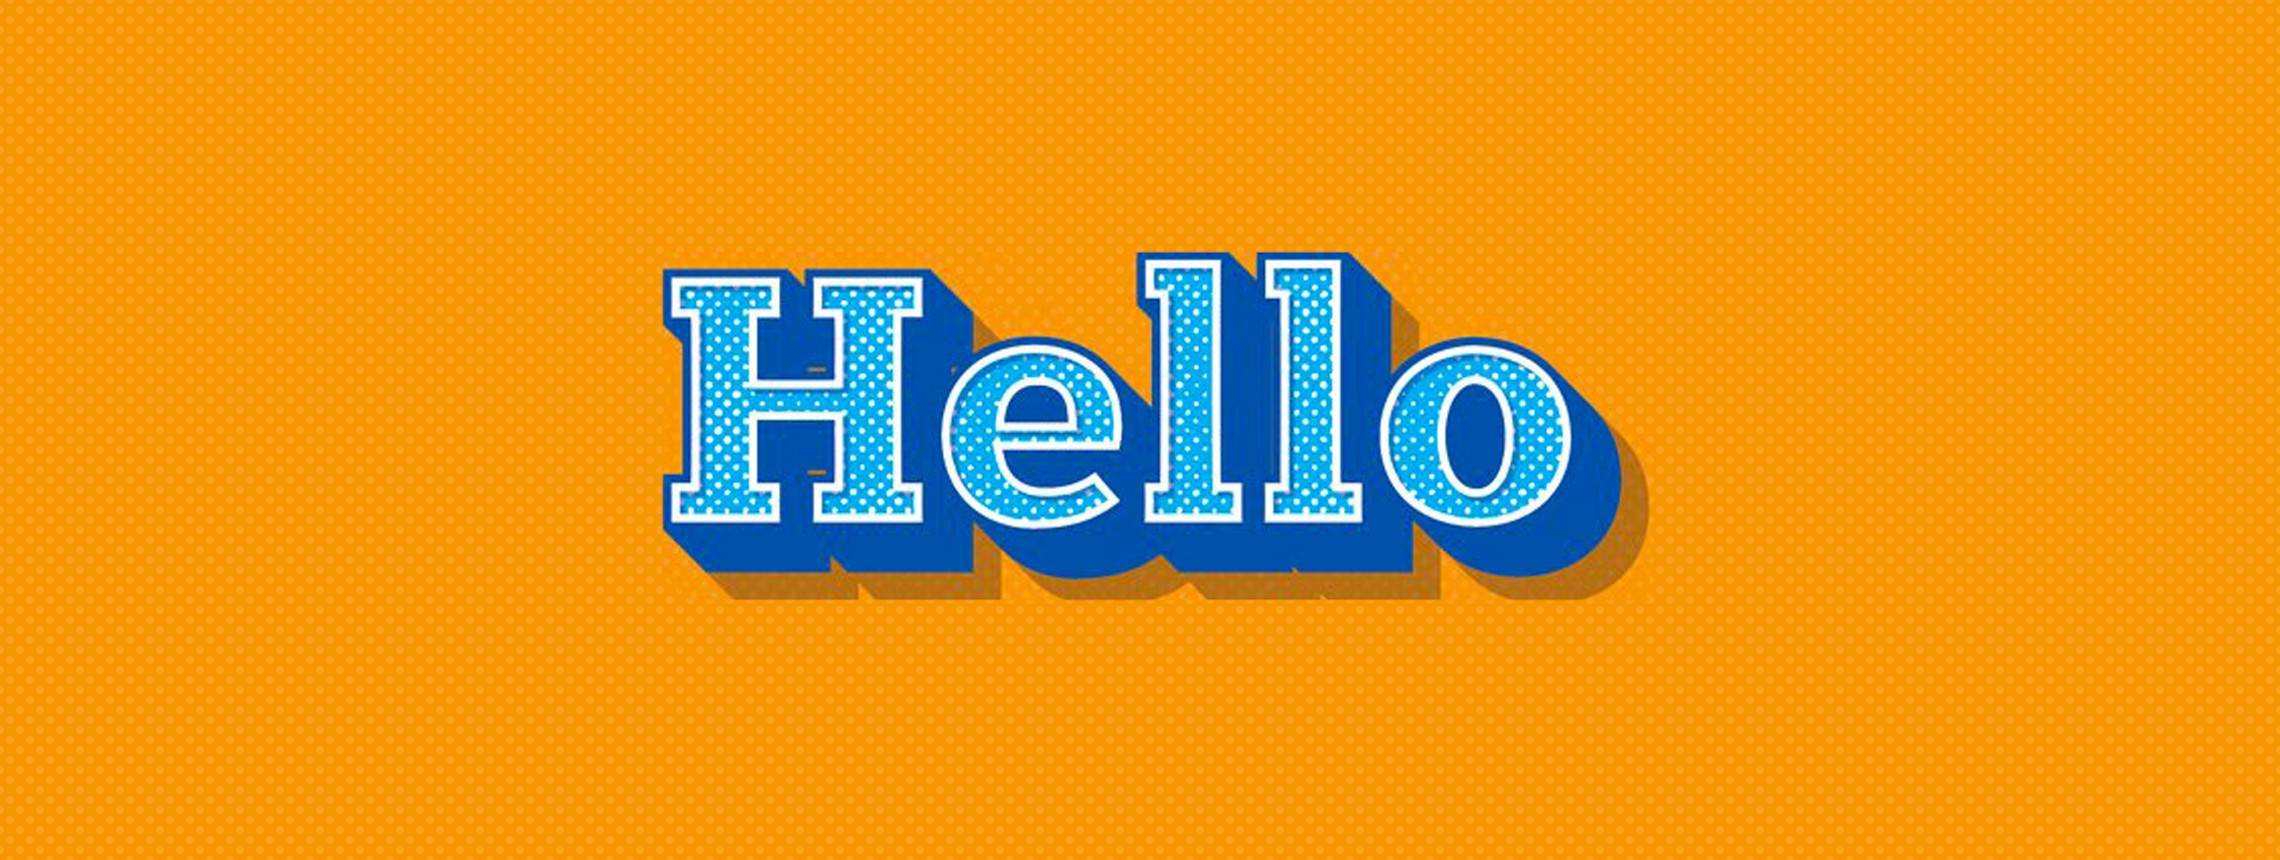 Create an Easy Retro Type Effect in Adobe Illustrator